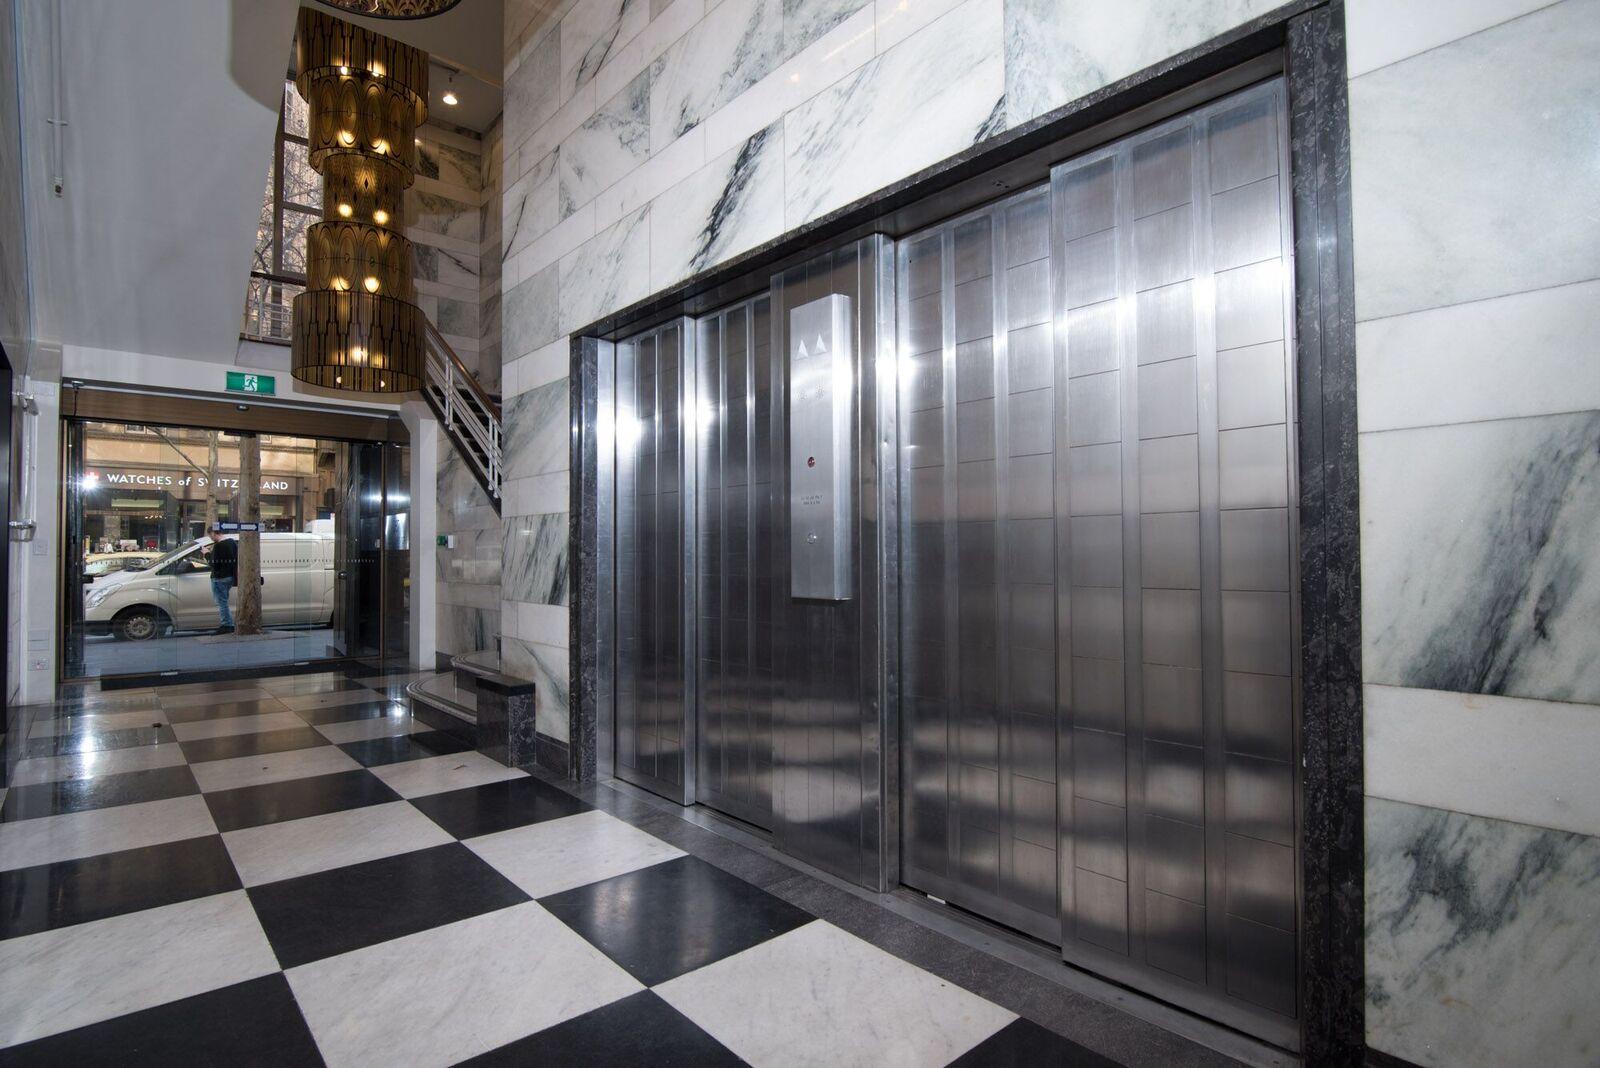 287-Collins-st-foyer.jpg